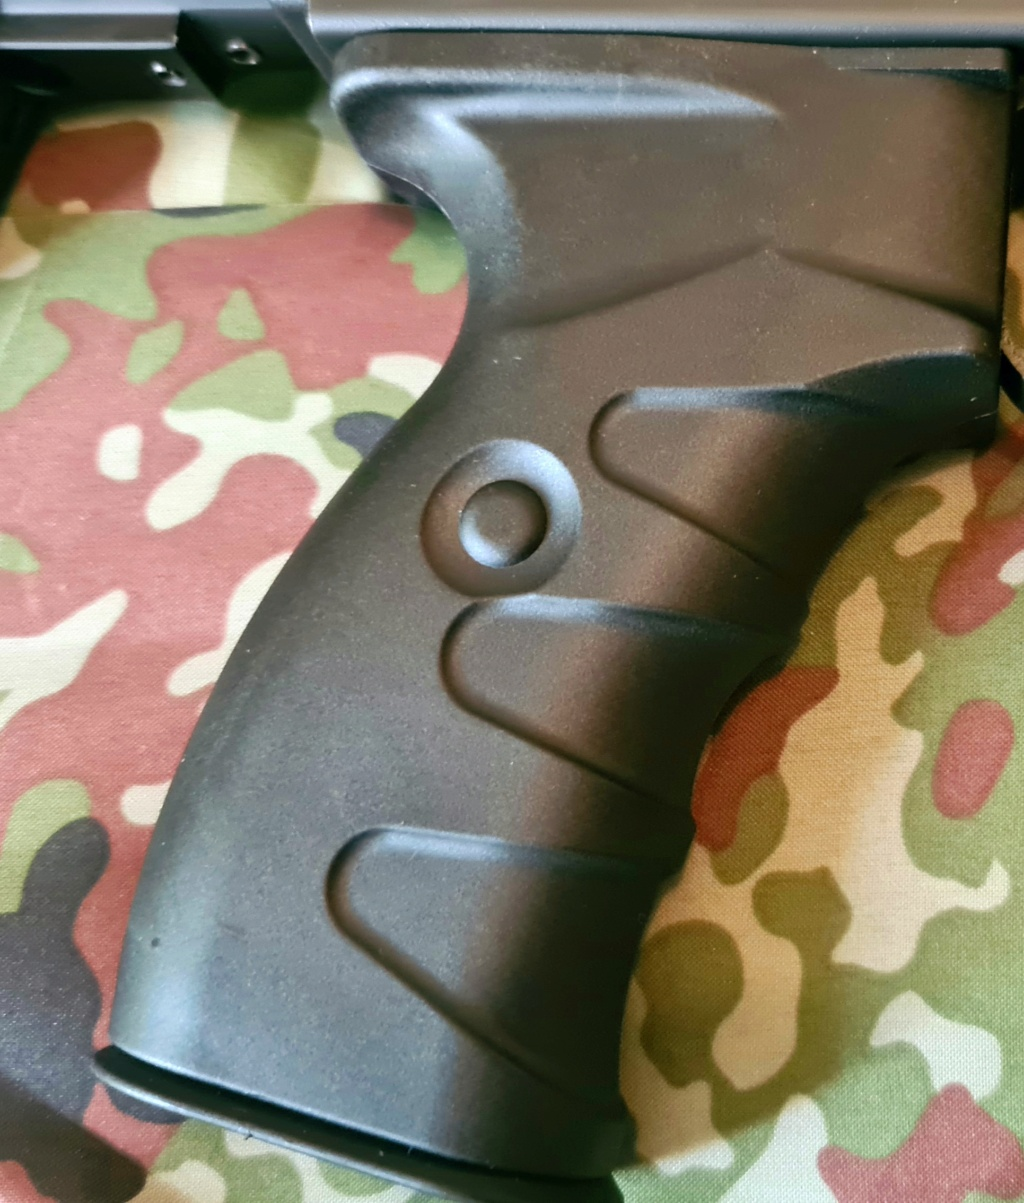 ARCTURUS - AT-AK 12 - AEG - Review Terminée! 20210816